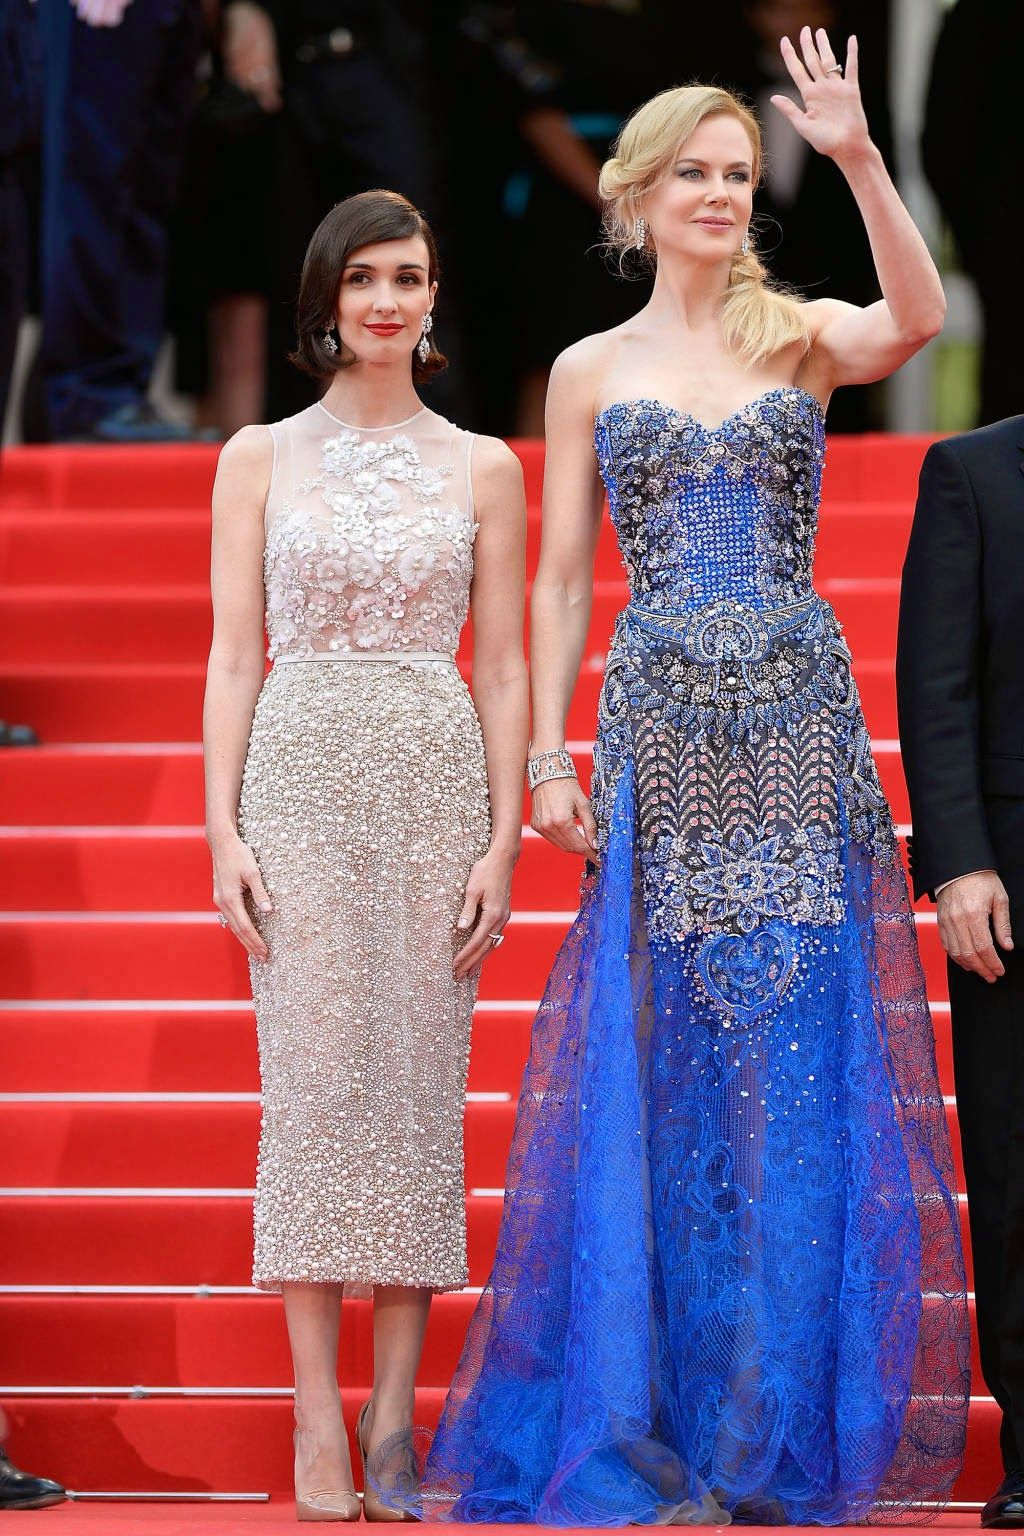 #Cannes #FilmFestival #2014 #NicoleKidman #ArmaniPrive #PazVega #ElieSaab #GraceDiMonaco Foto e post su #GlobArts: http://glob-arts.blogspot.it/2014/05/cannes-2014-film-festival-look-beauty.html #Chenepensate?